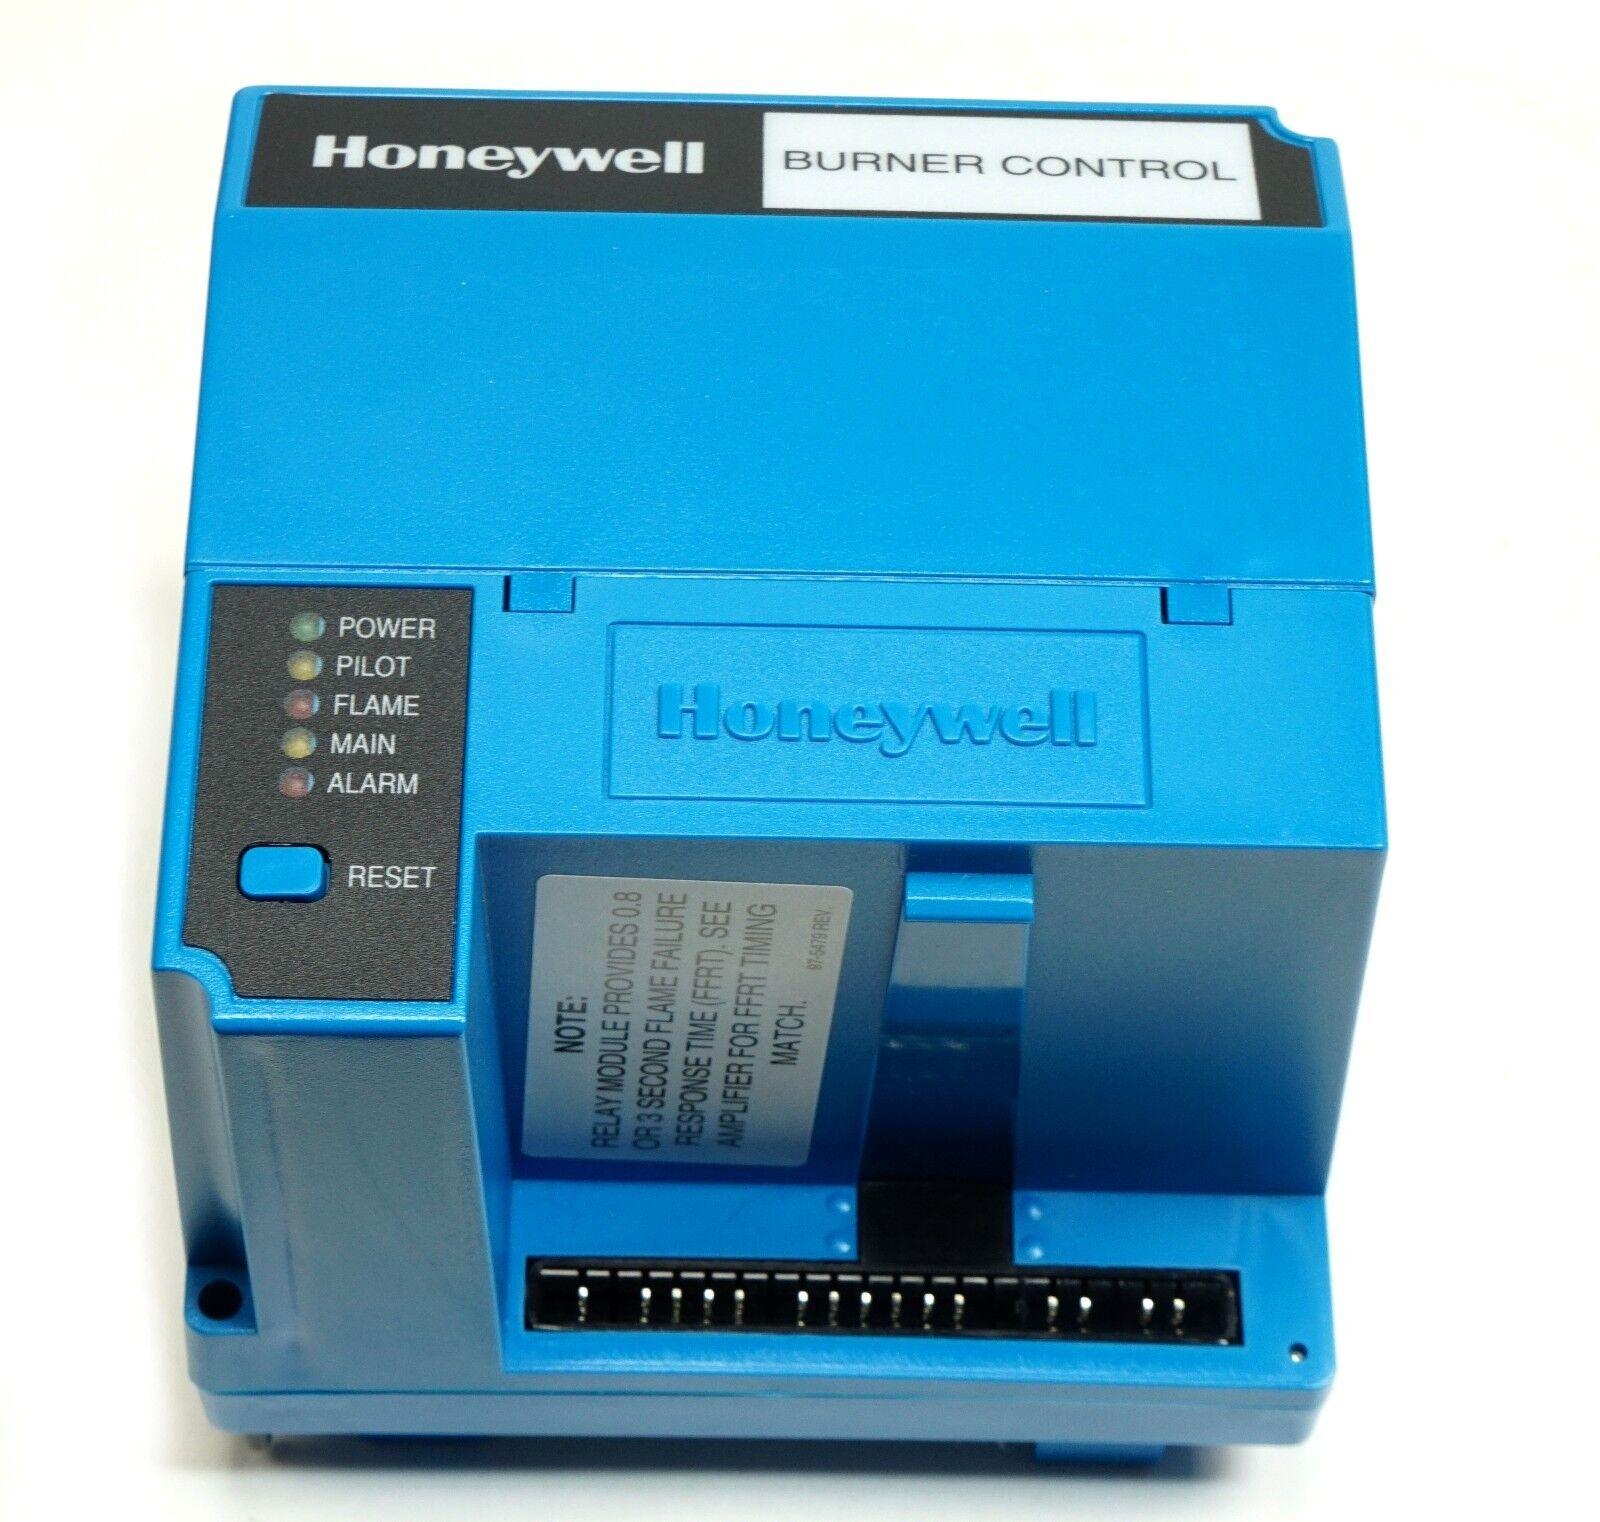 Honeywell RM7890